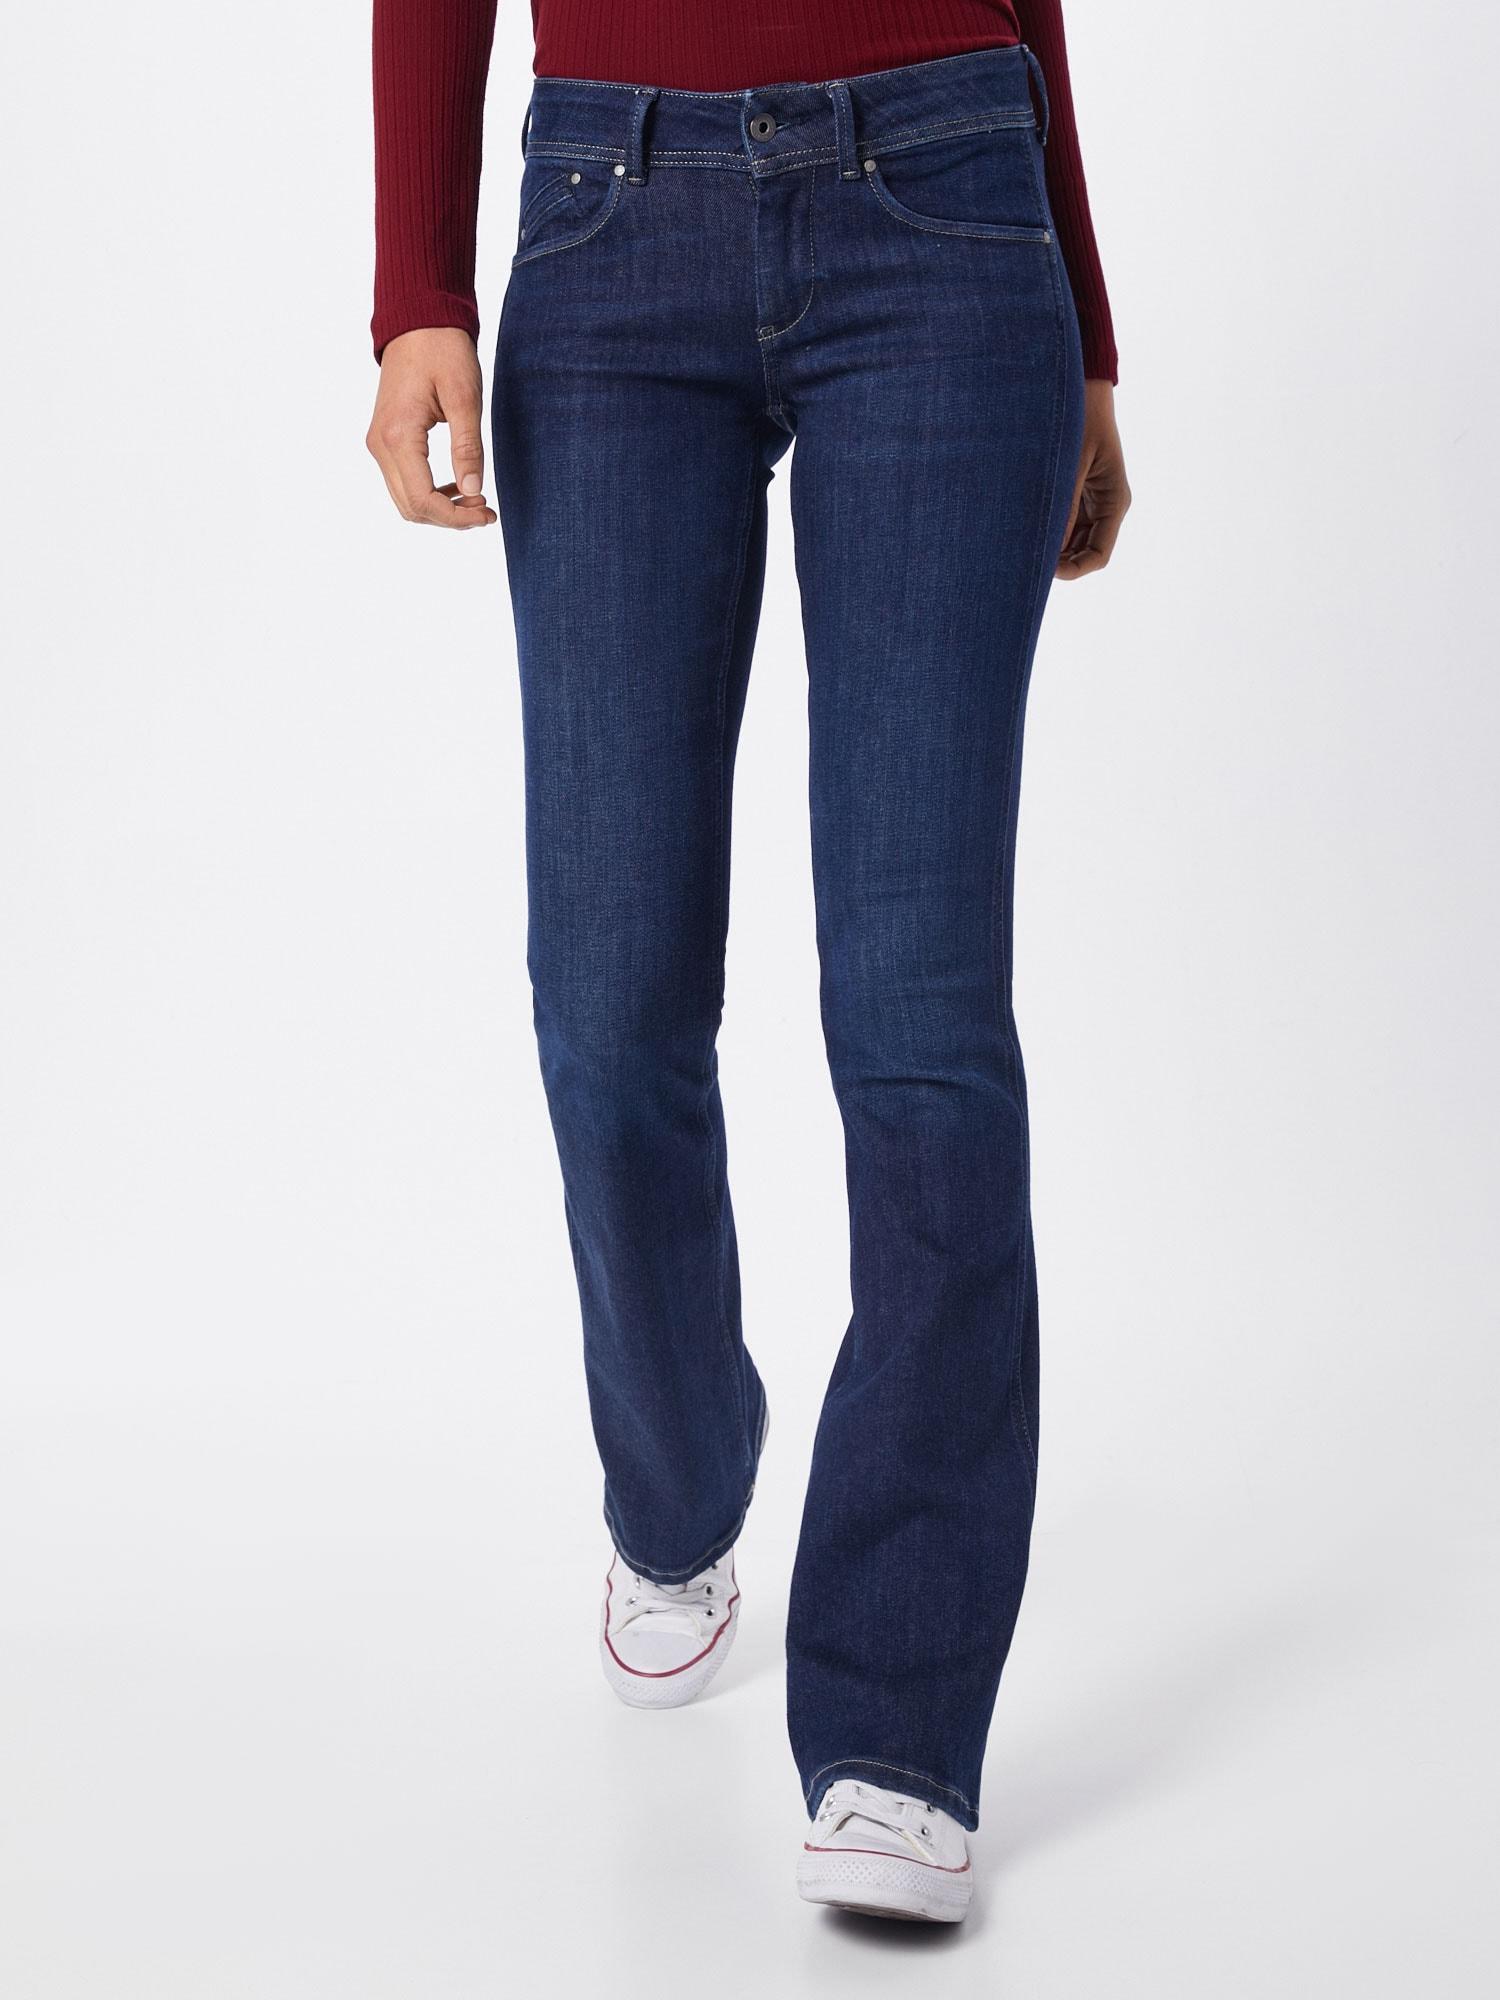 pepe jeans - Jeans-Schlaghose 'Pimlico'